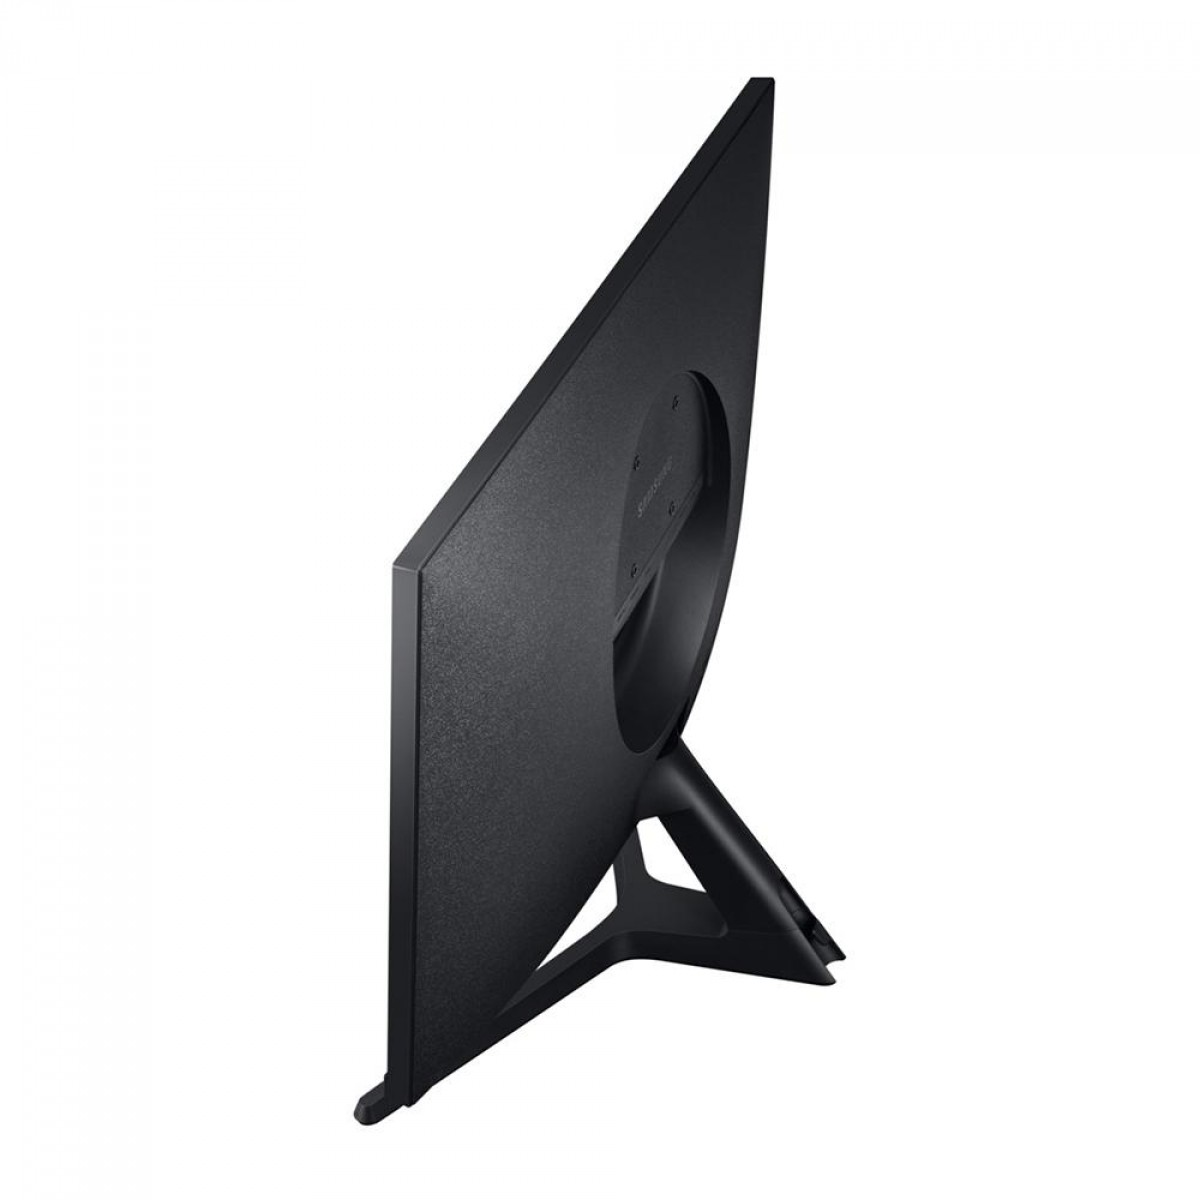 Monitor Gamer Samsung, LU28R550UQLMZD, 28 Pol, LED, 4K, UHD, IPS, FreeSync, HDMI, DP